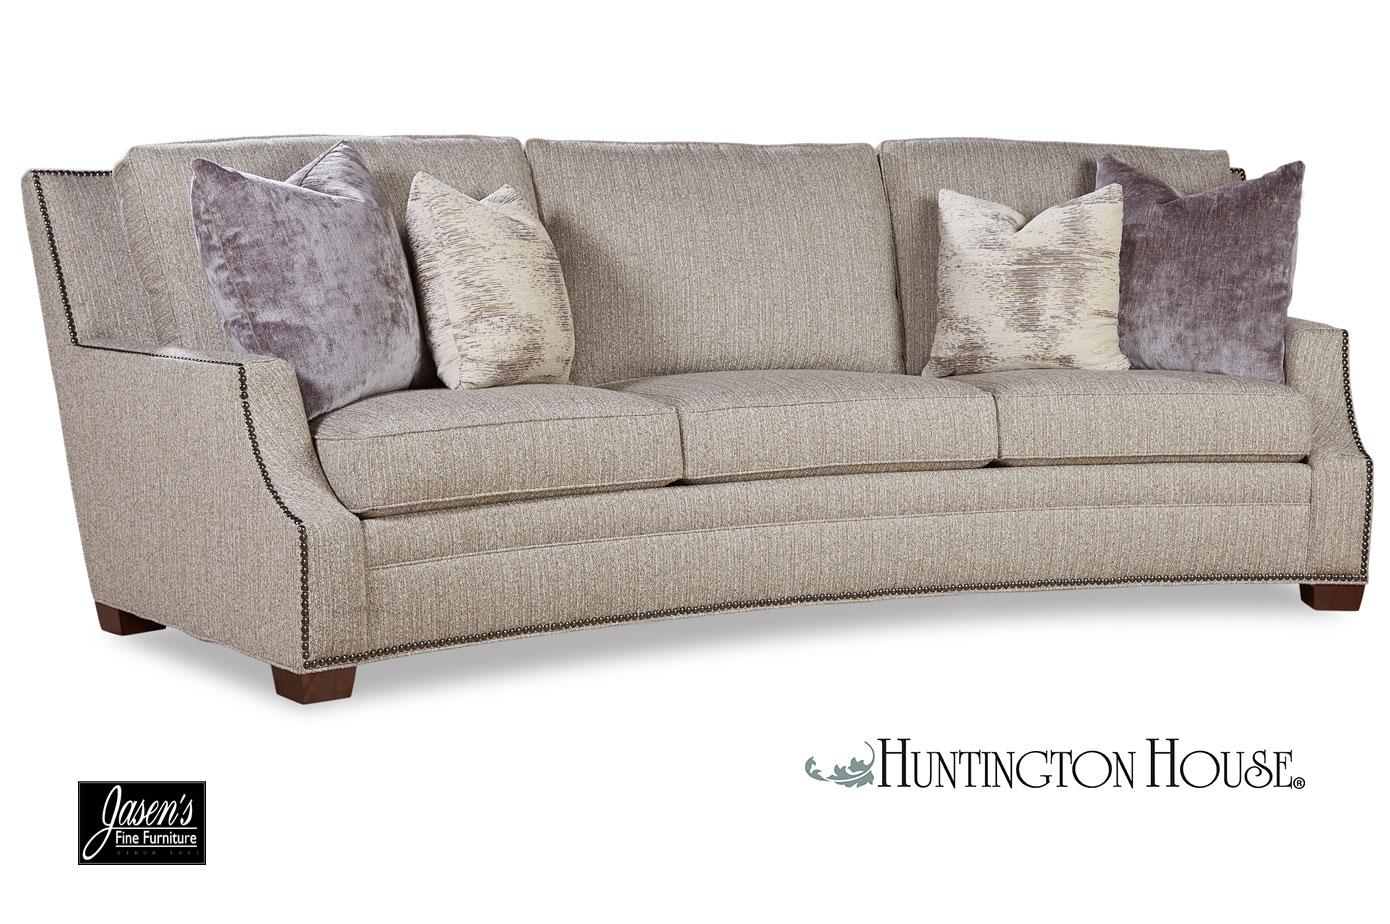 huntington house 2500 slope wedge sofa